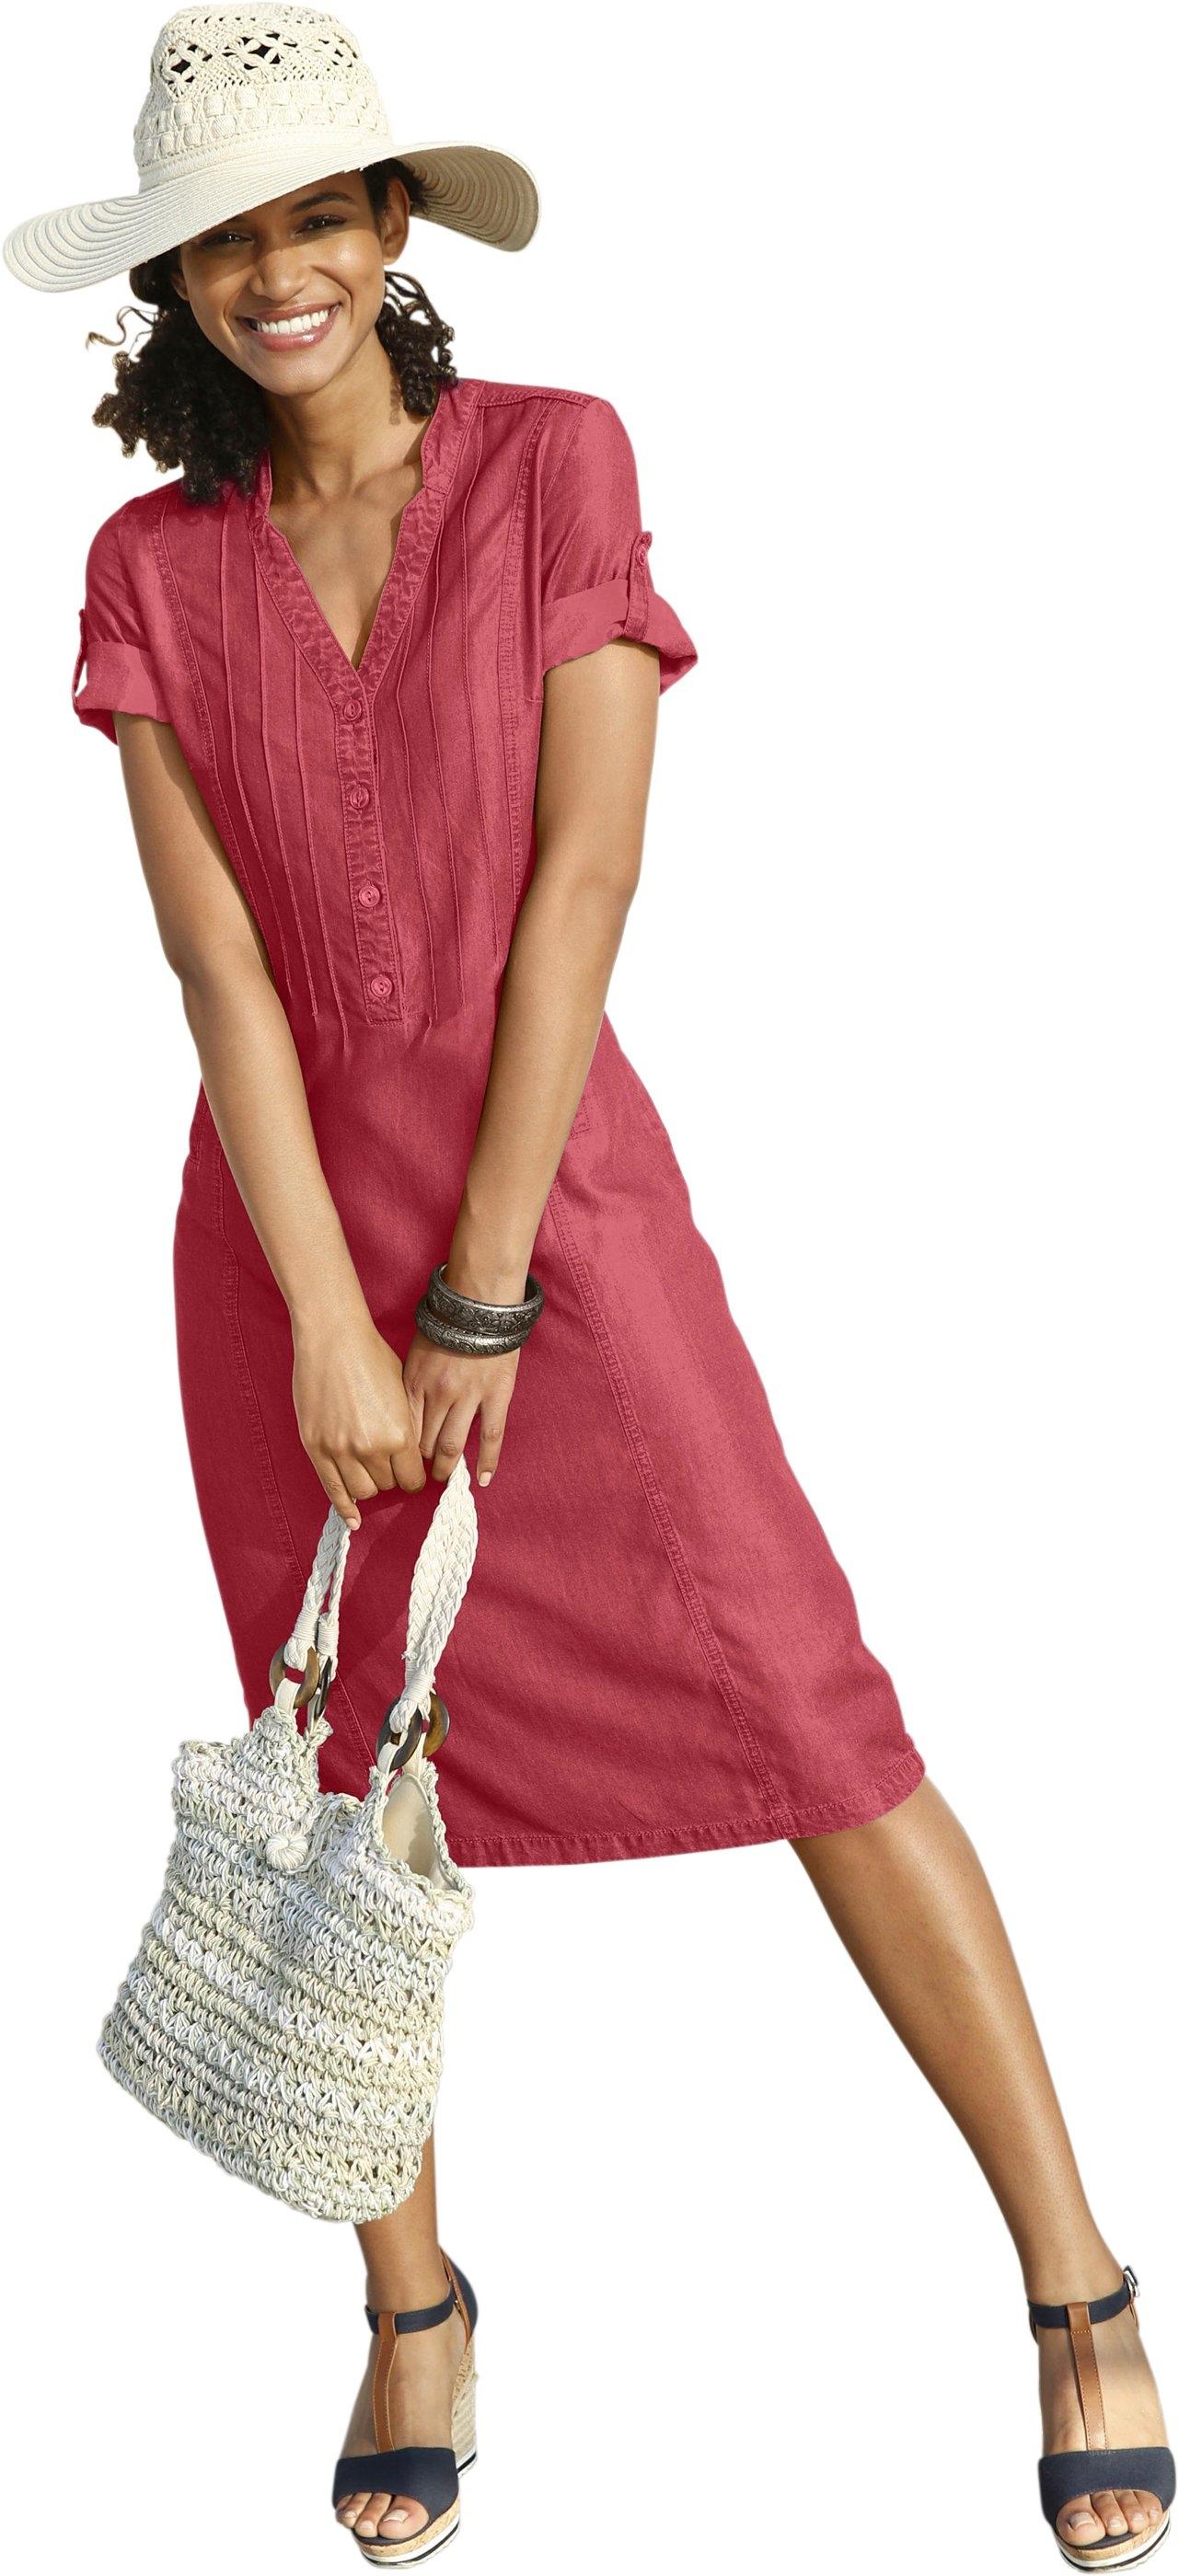 Casual Looks jurk in zachte, soepele kwaliteit - verschillende betaalmethodes